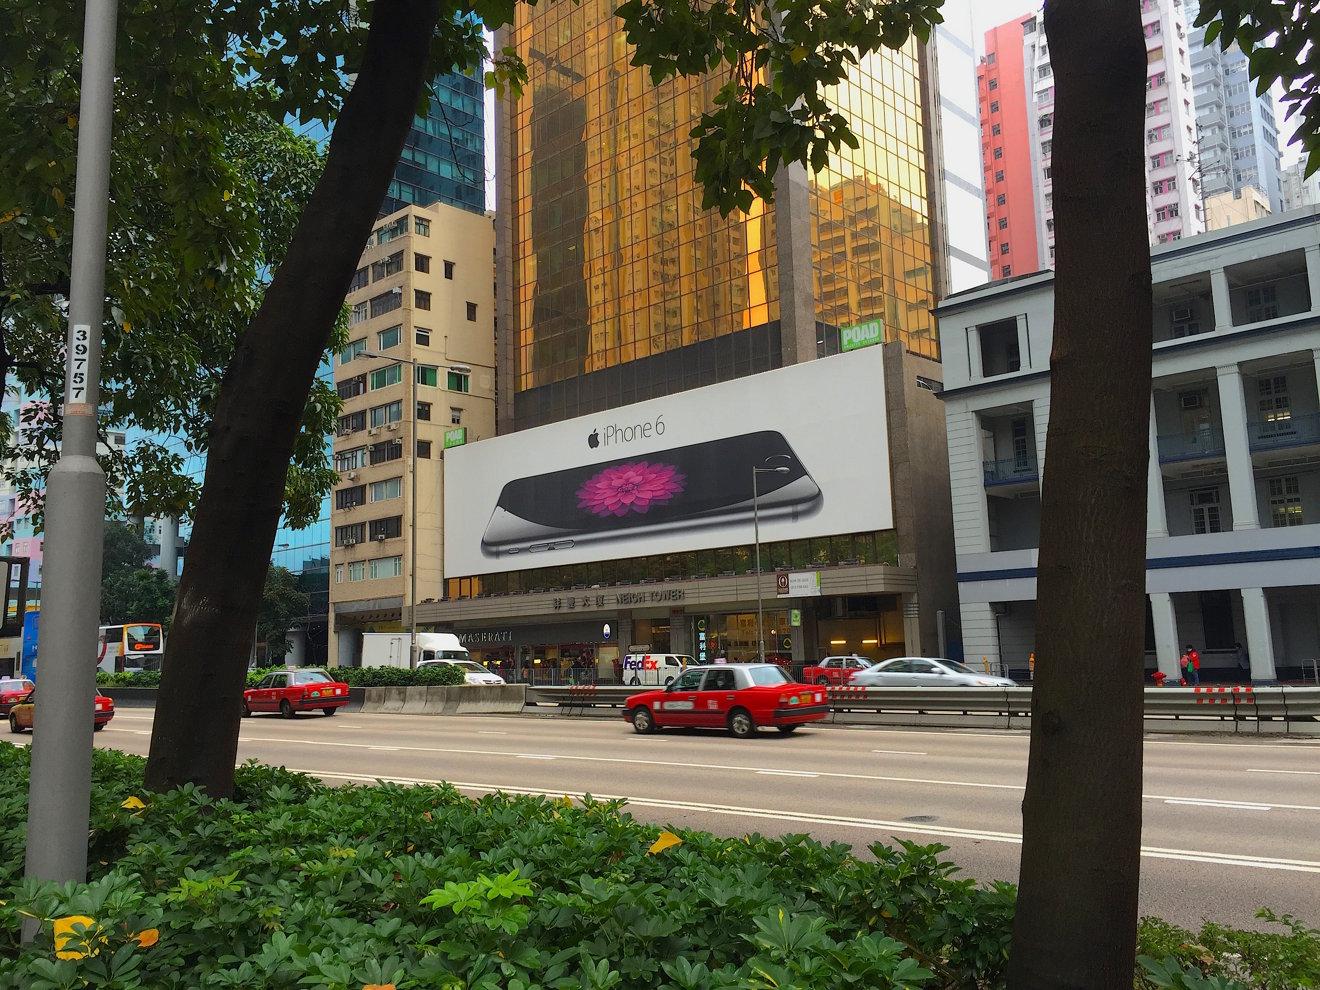 Apple iPhone 6 Billboard